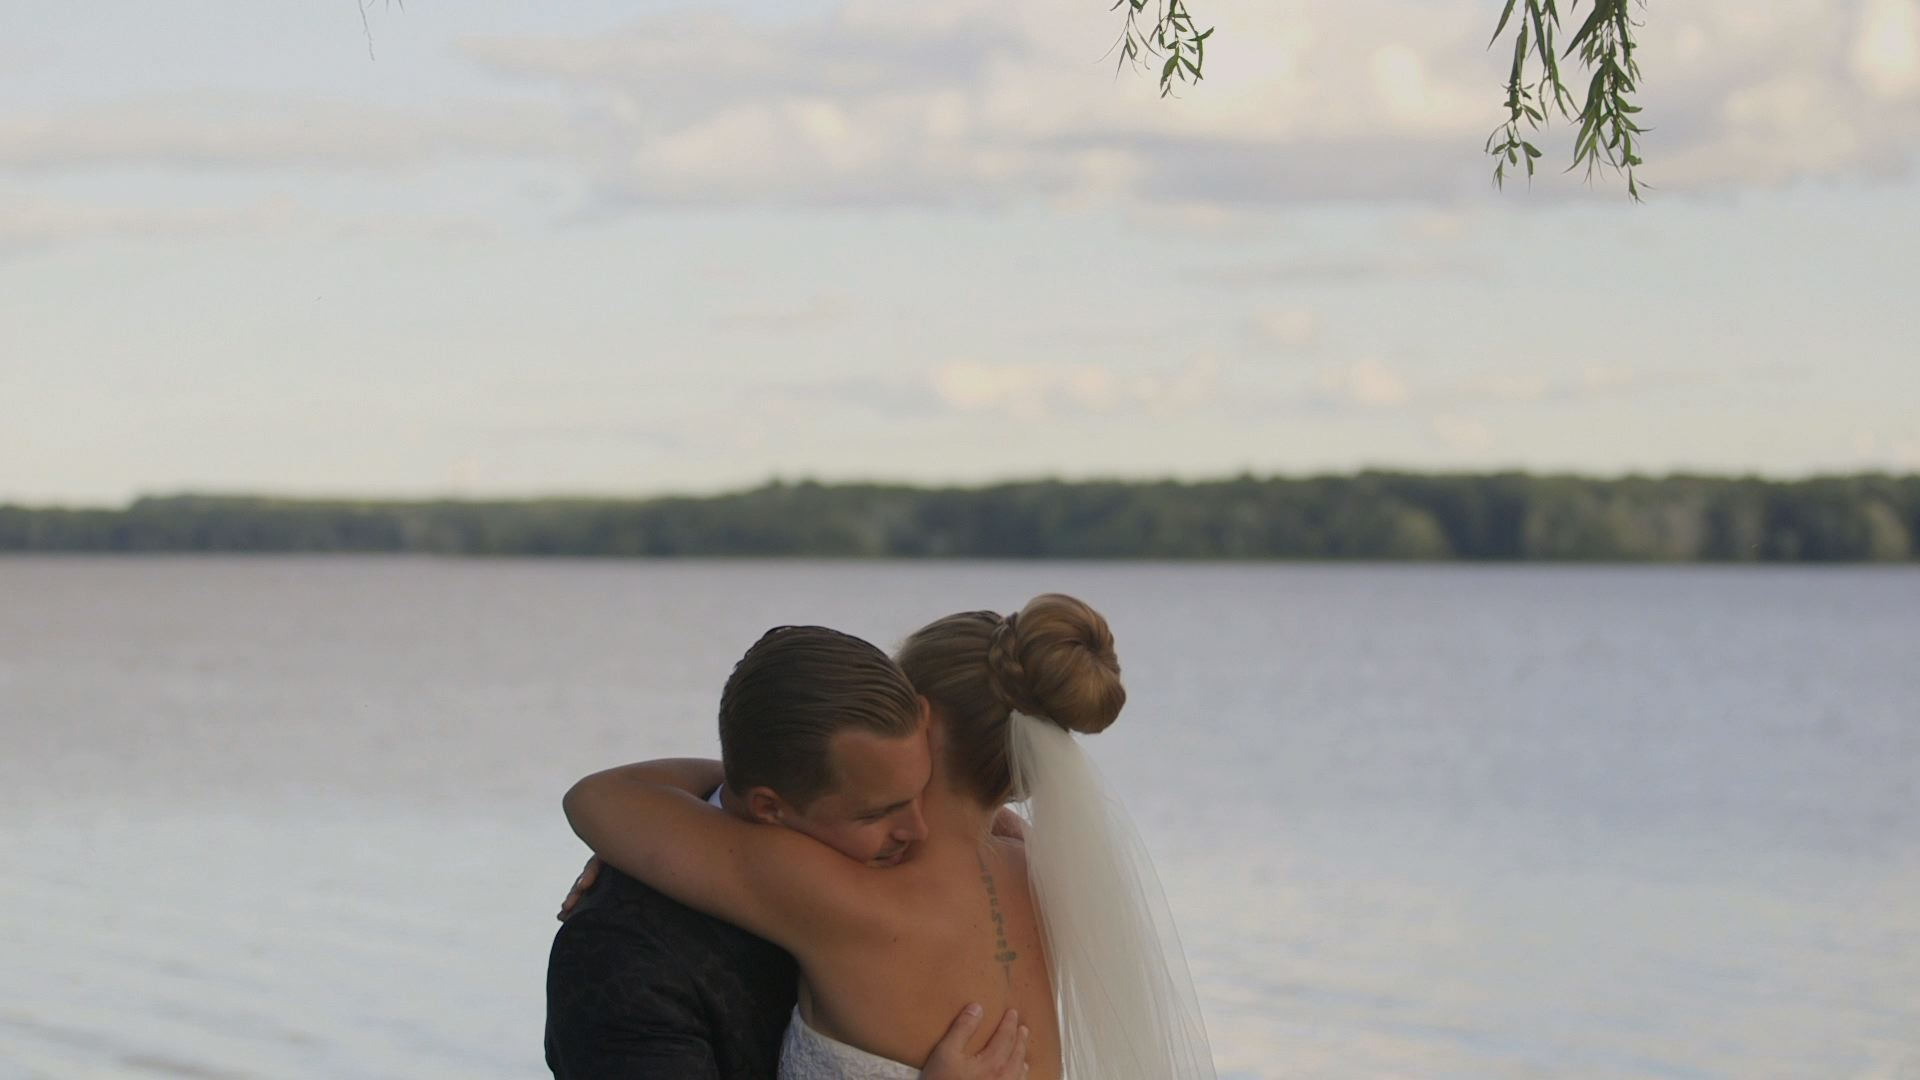 Château Vaudreuil Wedding | Ioan Films